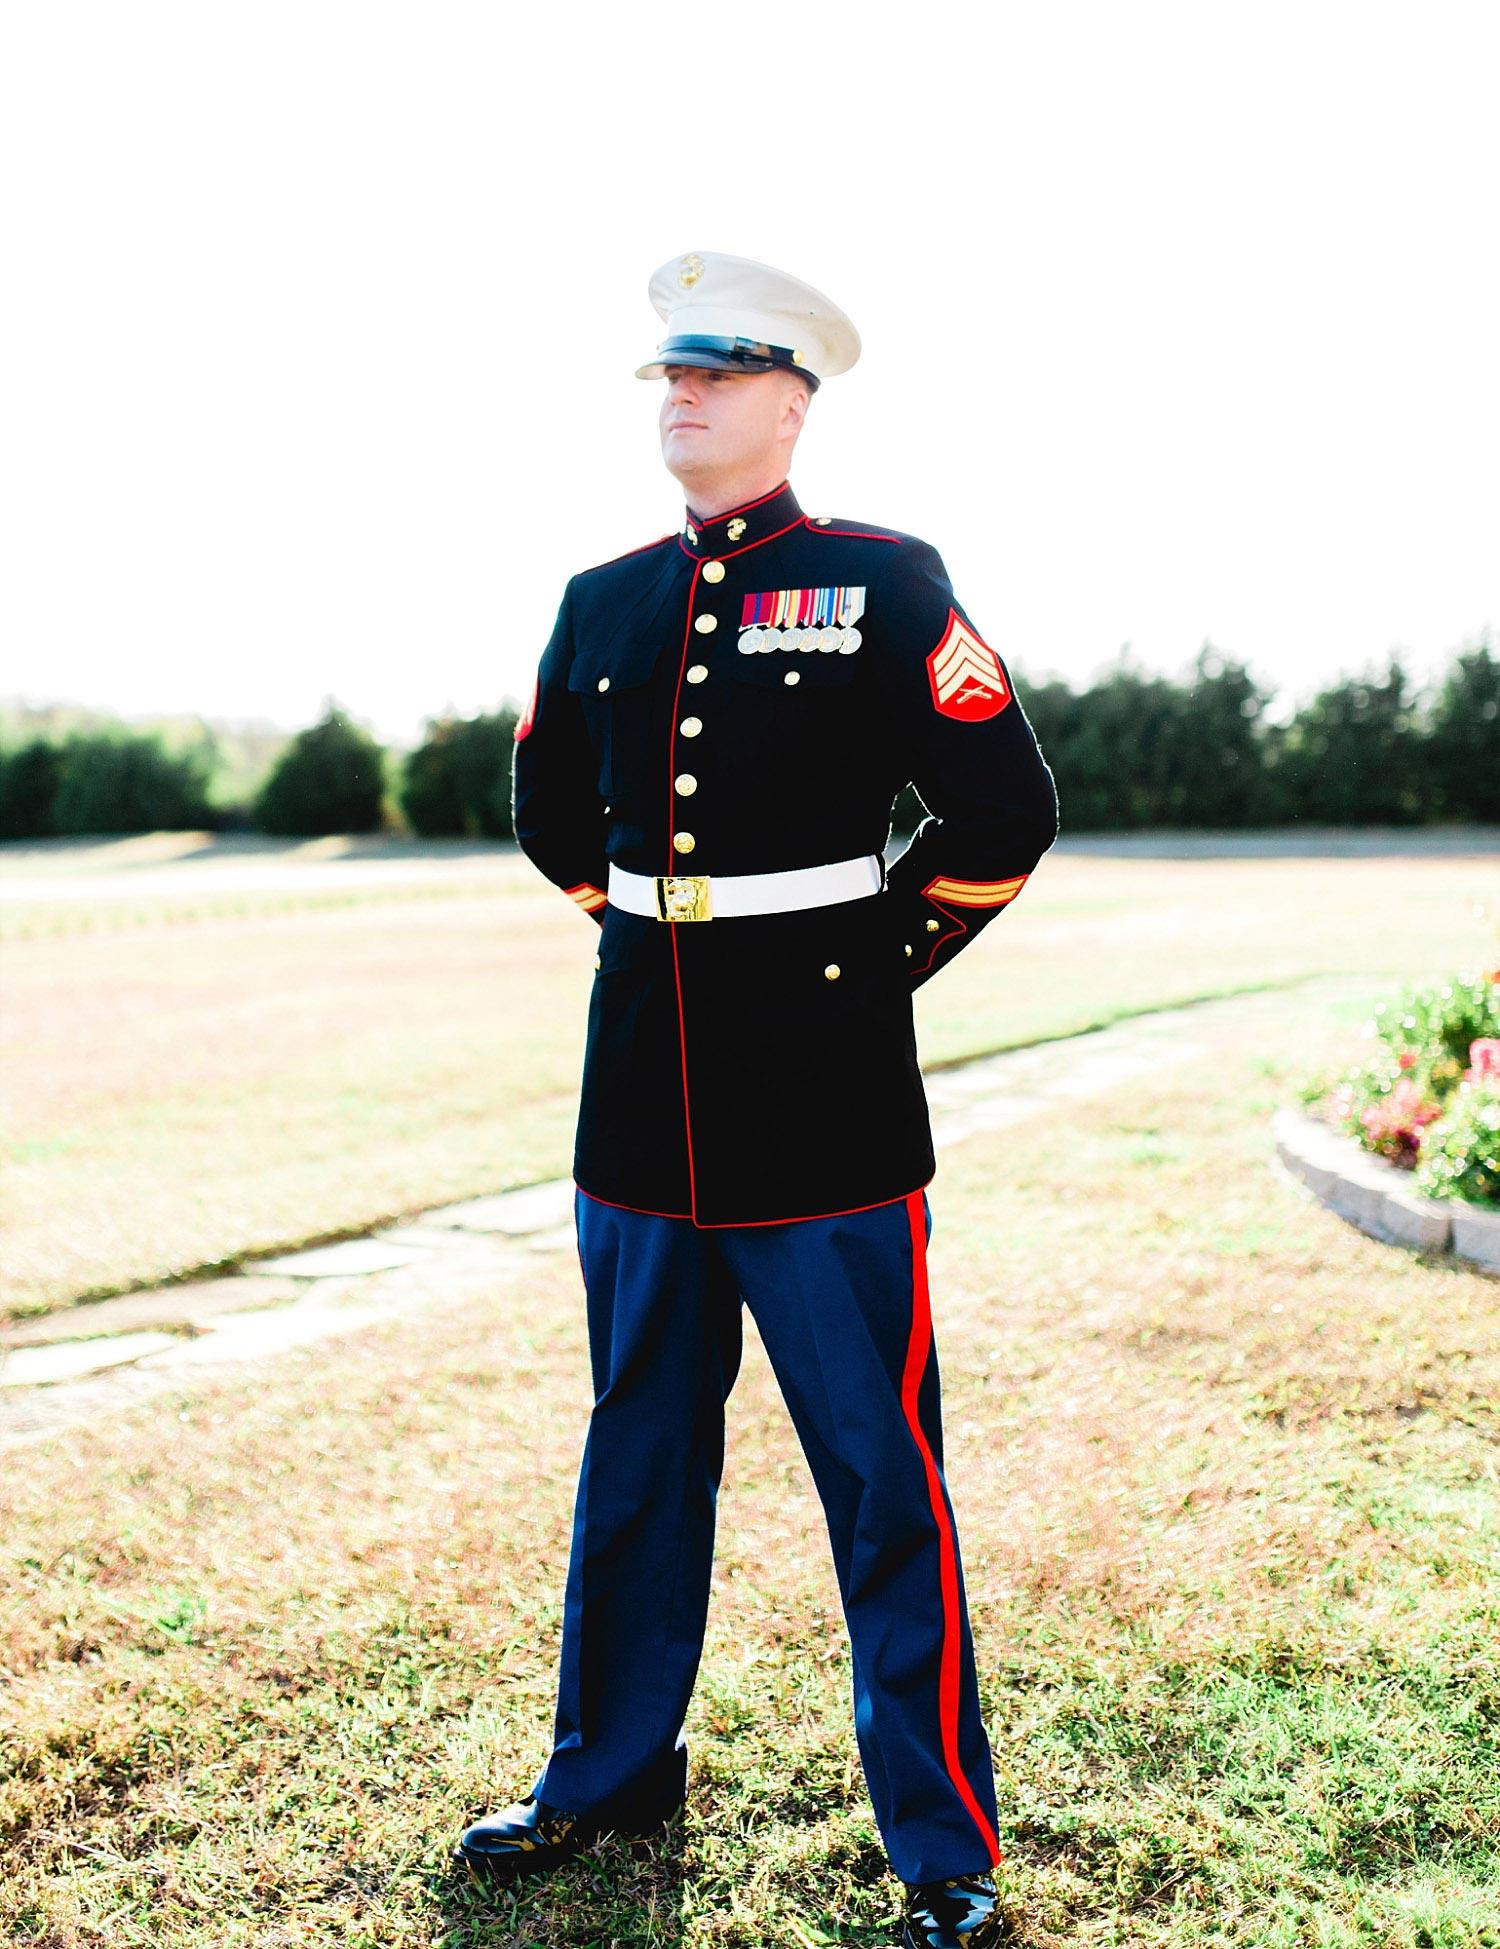 Castle at Rockwall wedding groom in marine uniform outside photo